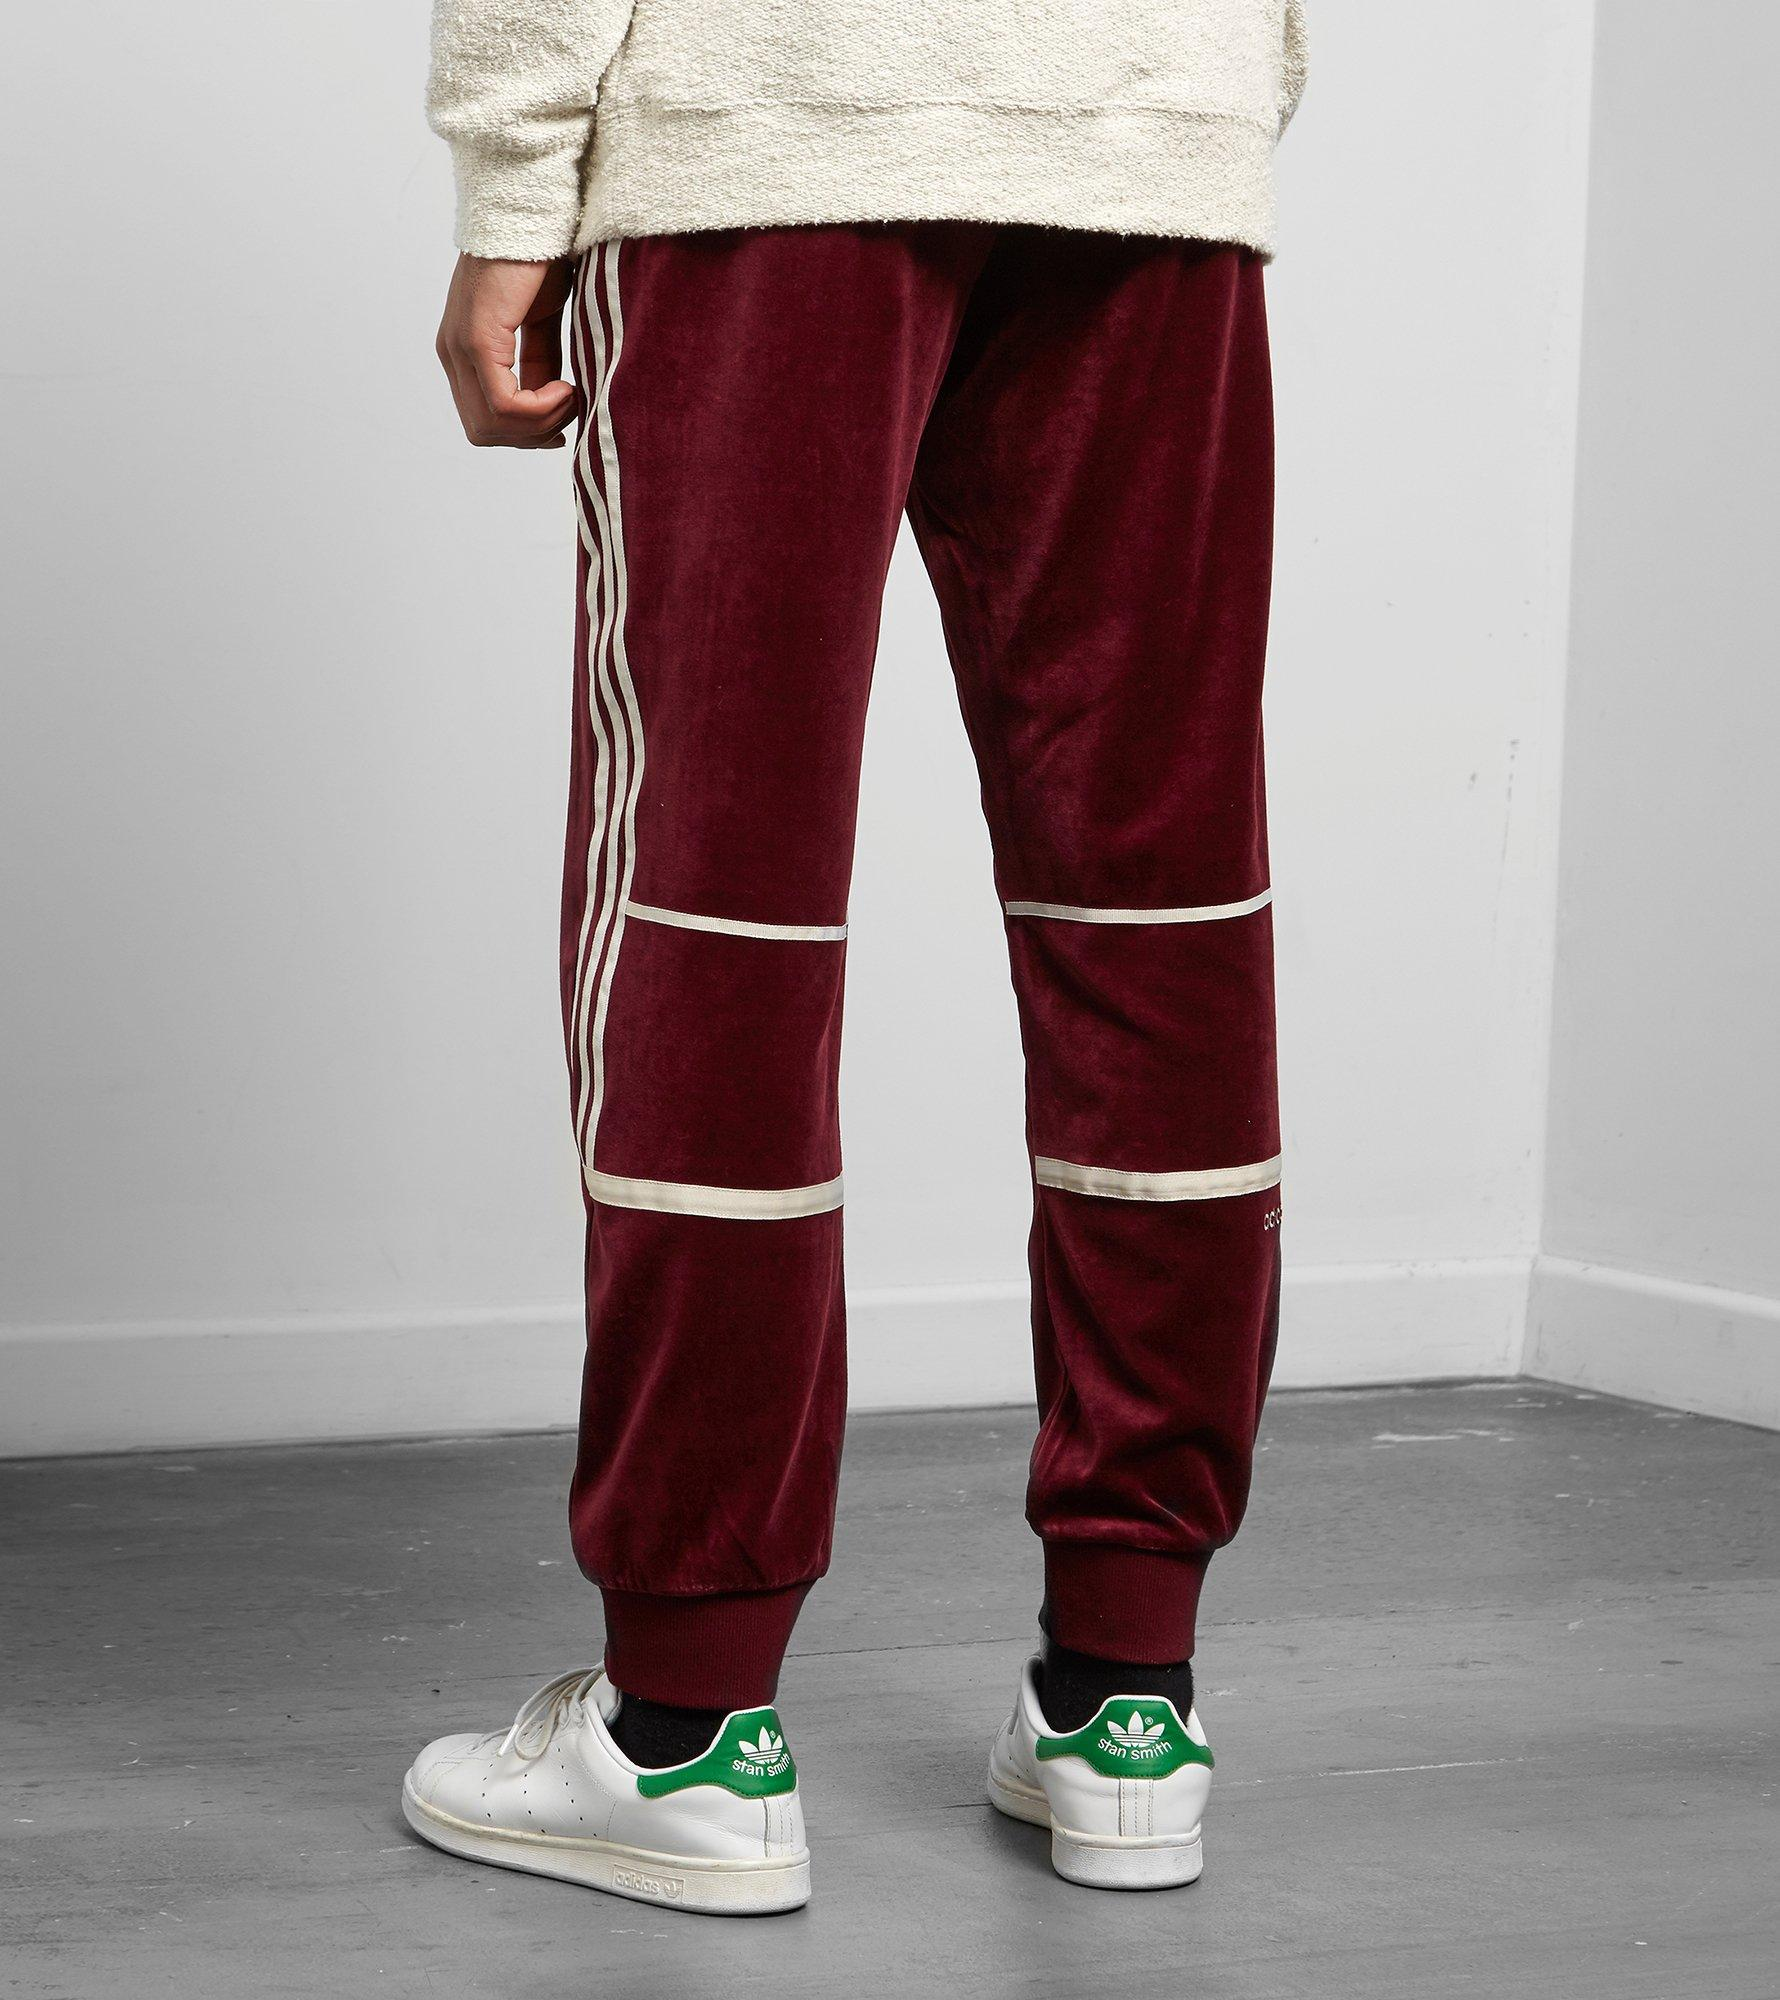 Adidas Originals Red Challenger Velour Track Pants for men